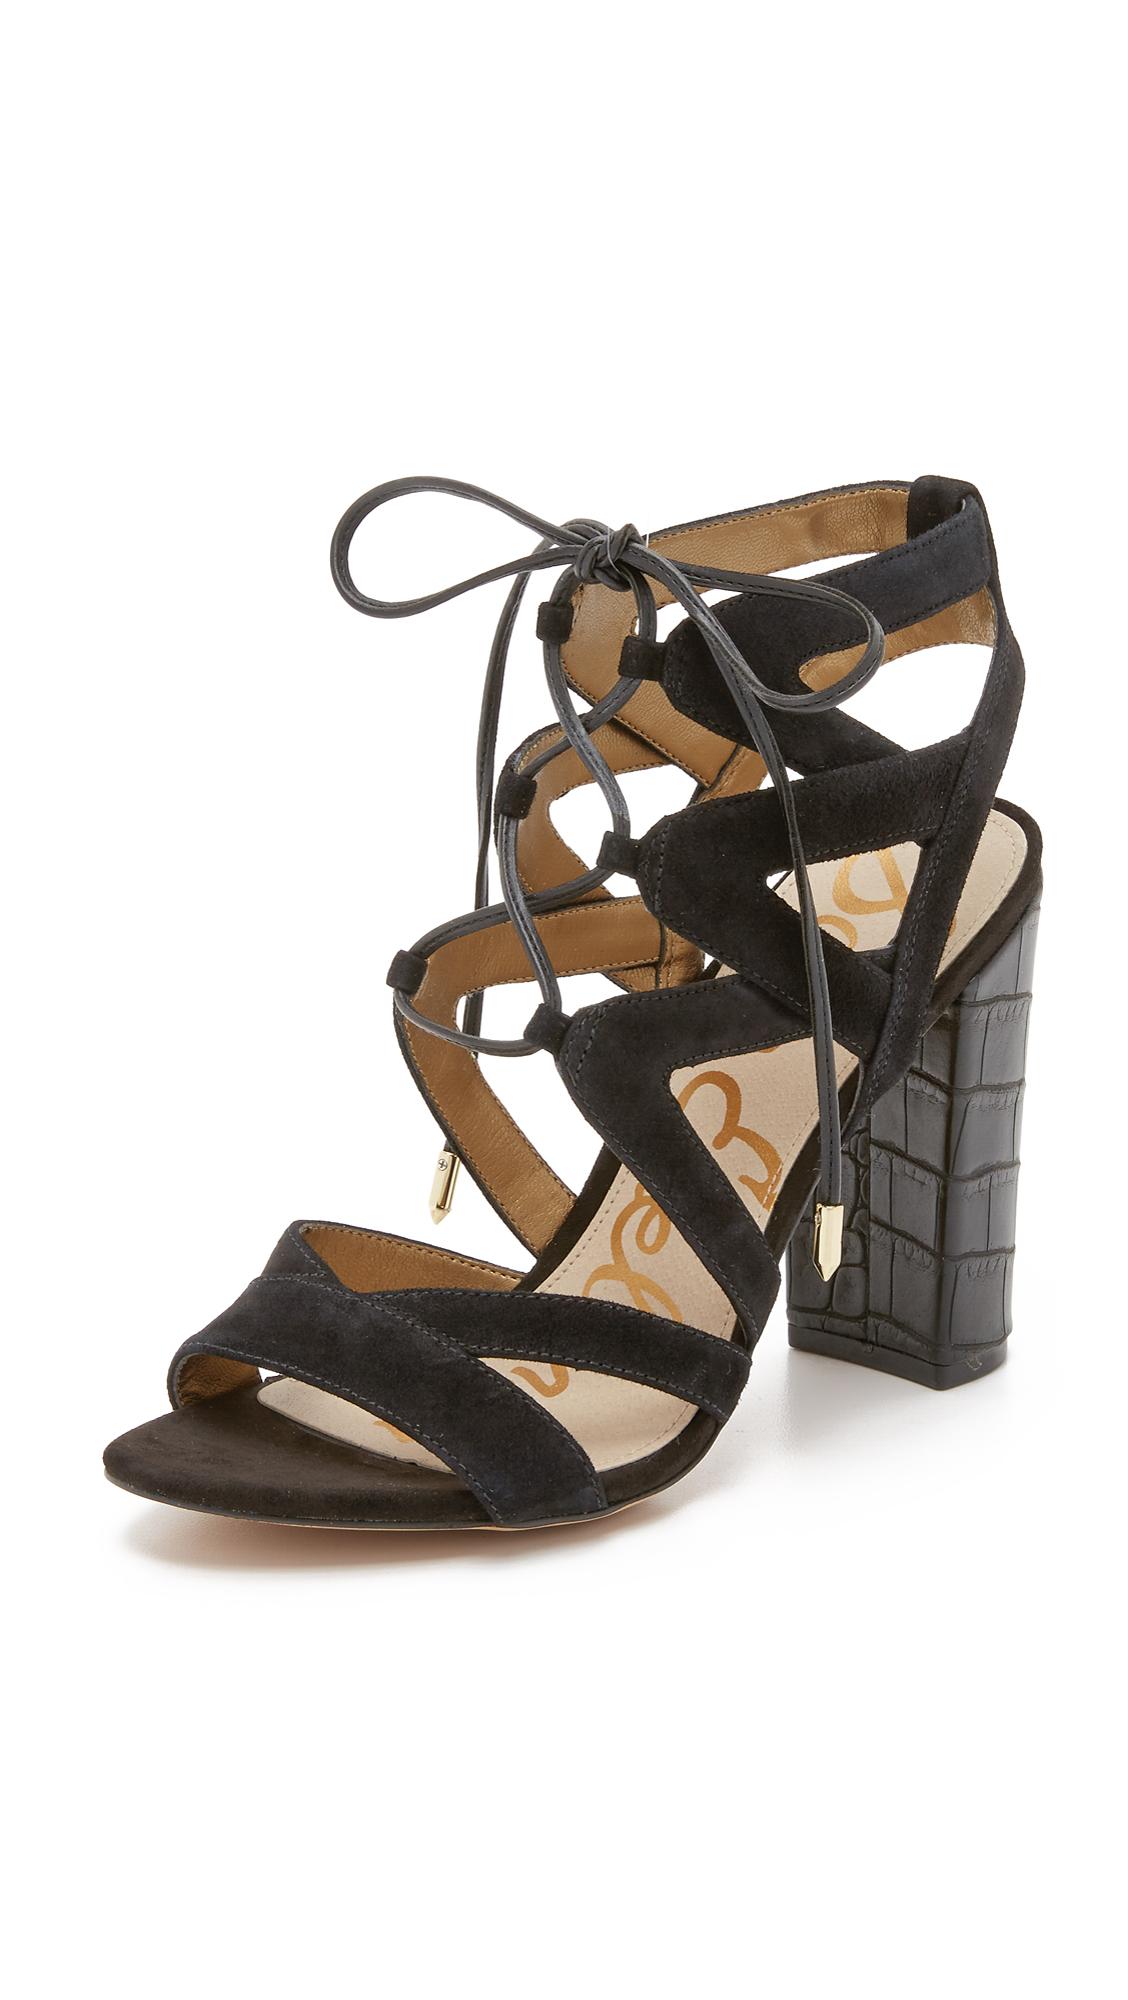 d64f9823ab57 Sam Edelman Yardley Lace Up Sandals